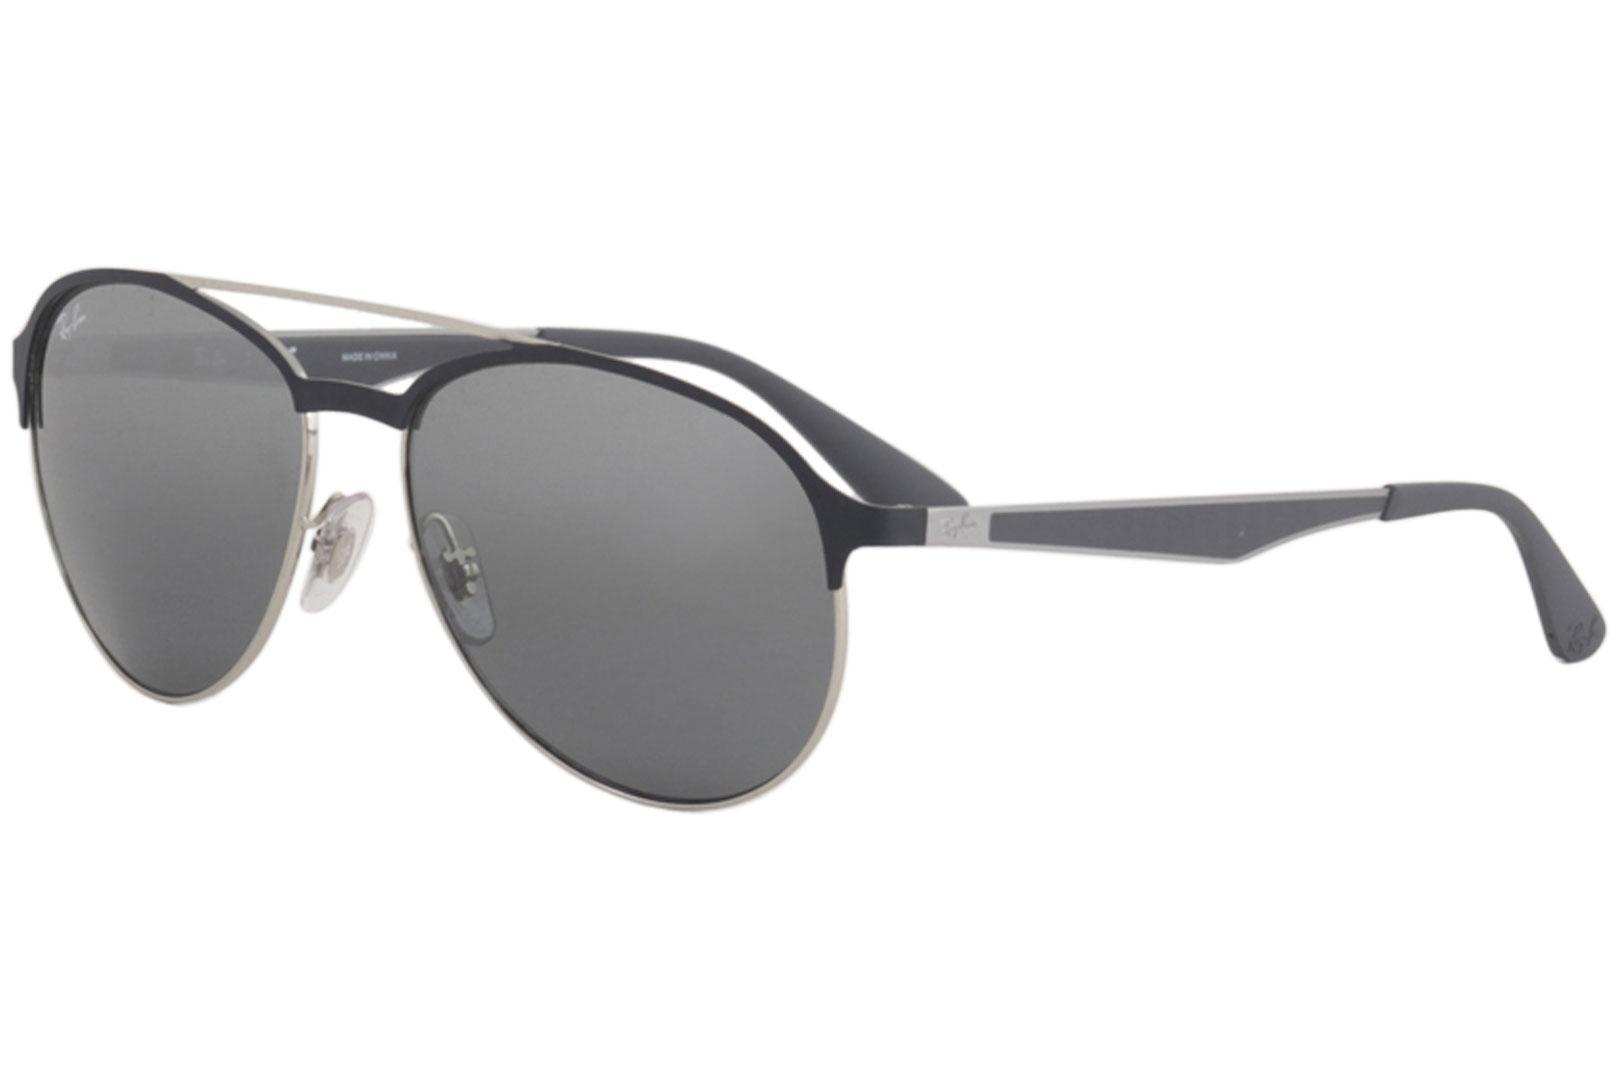 501a16c703 Ray Ban Men s RB3606 RB 3606 RayBan Fashion Pilot Sunglasses